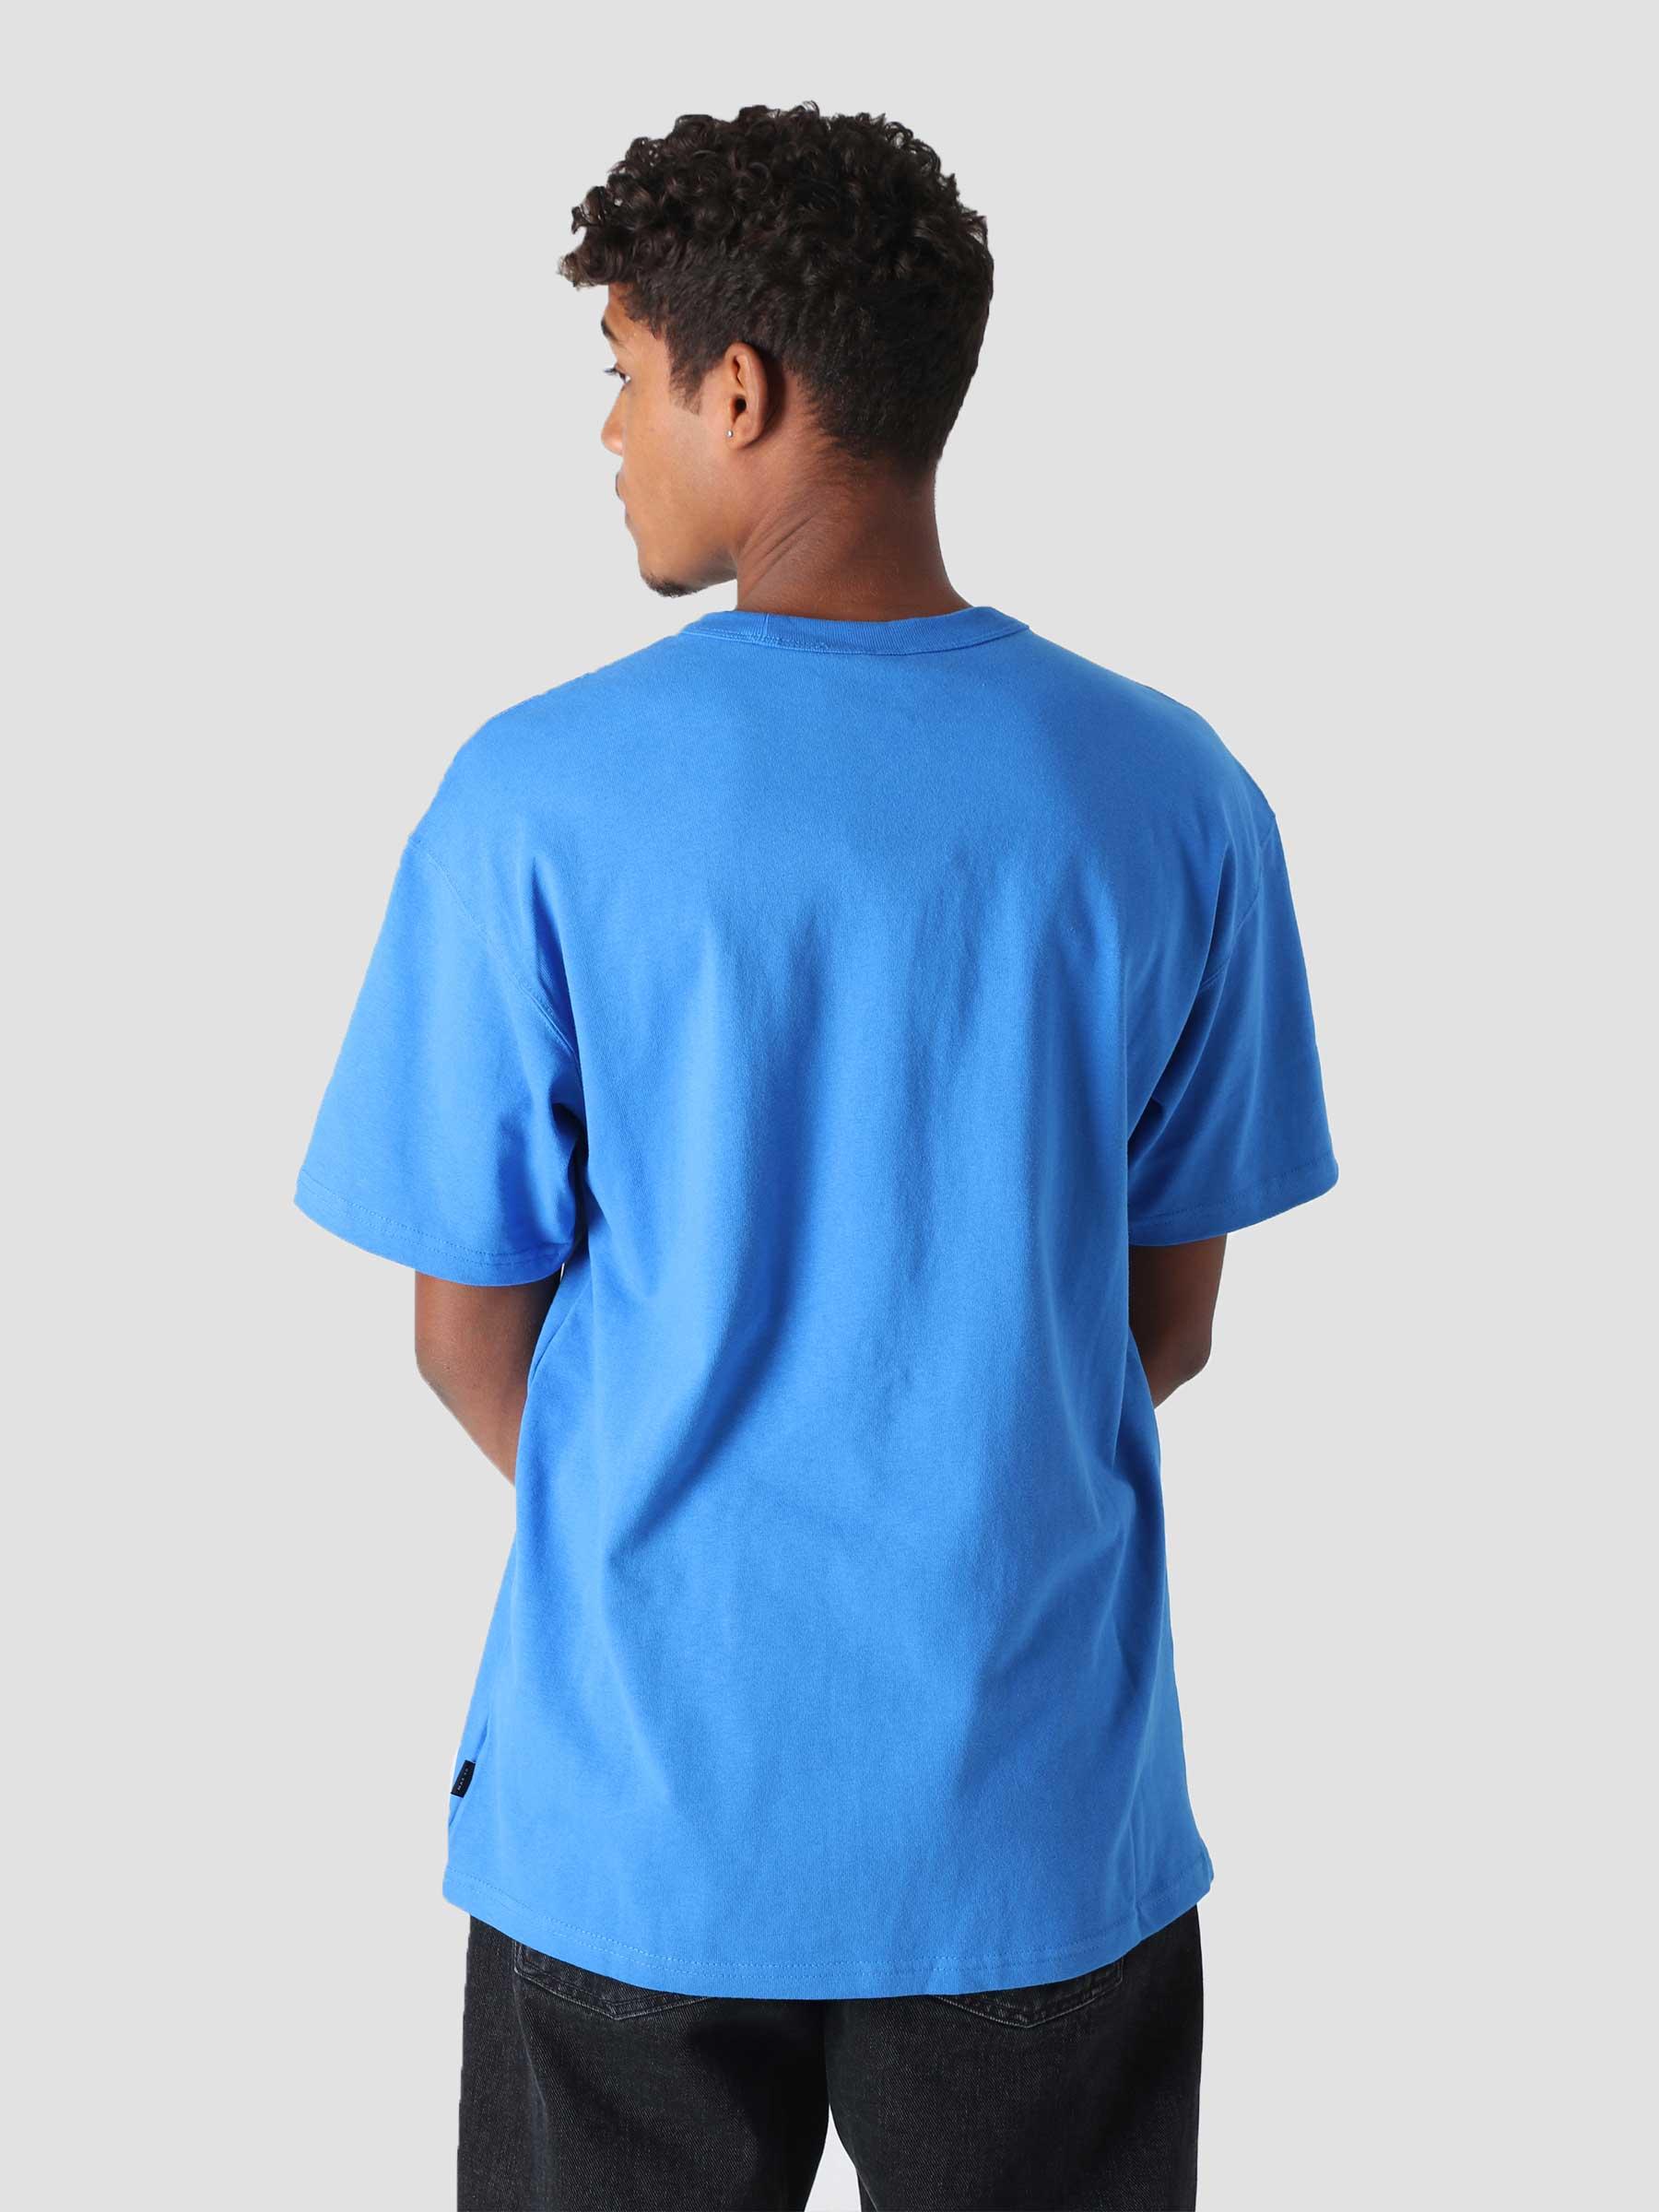 M NSW T-Shirt Premium Essential Signal Blue Black DB3193-403